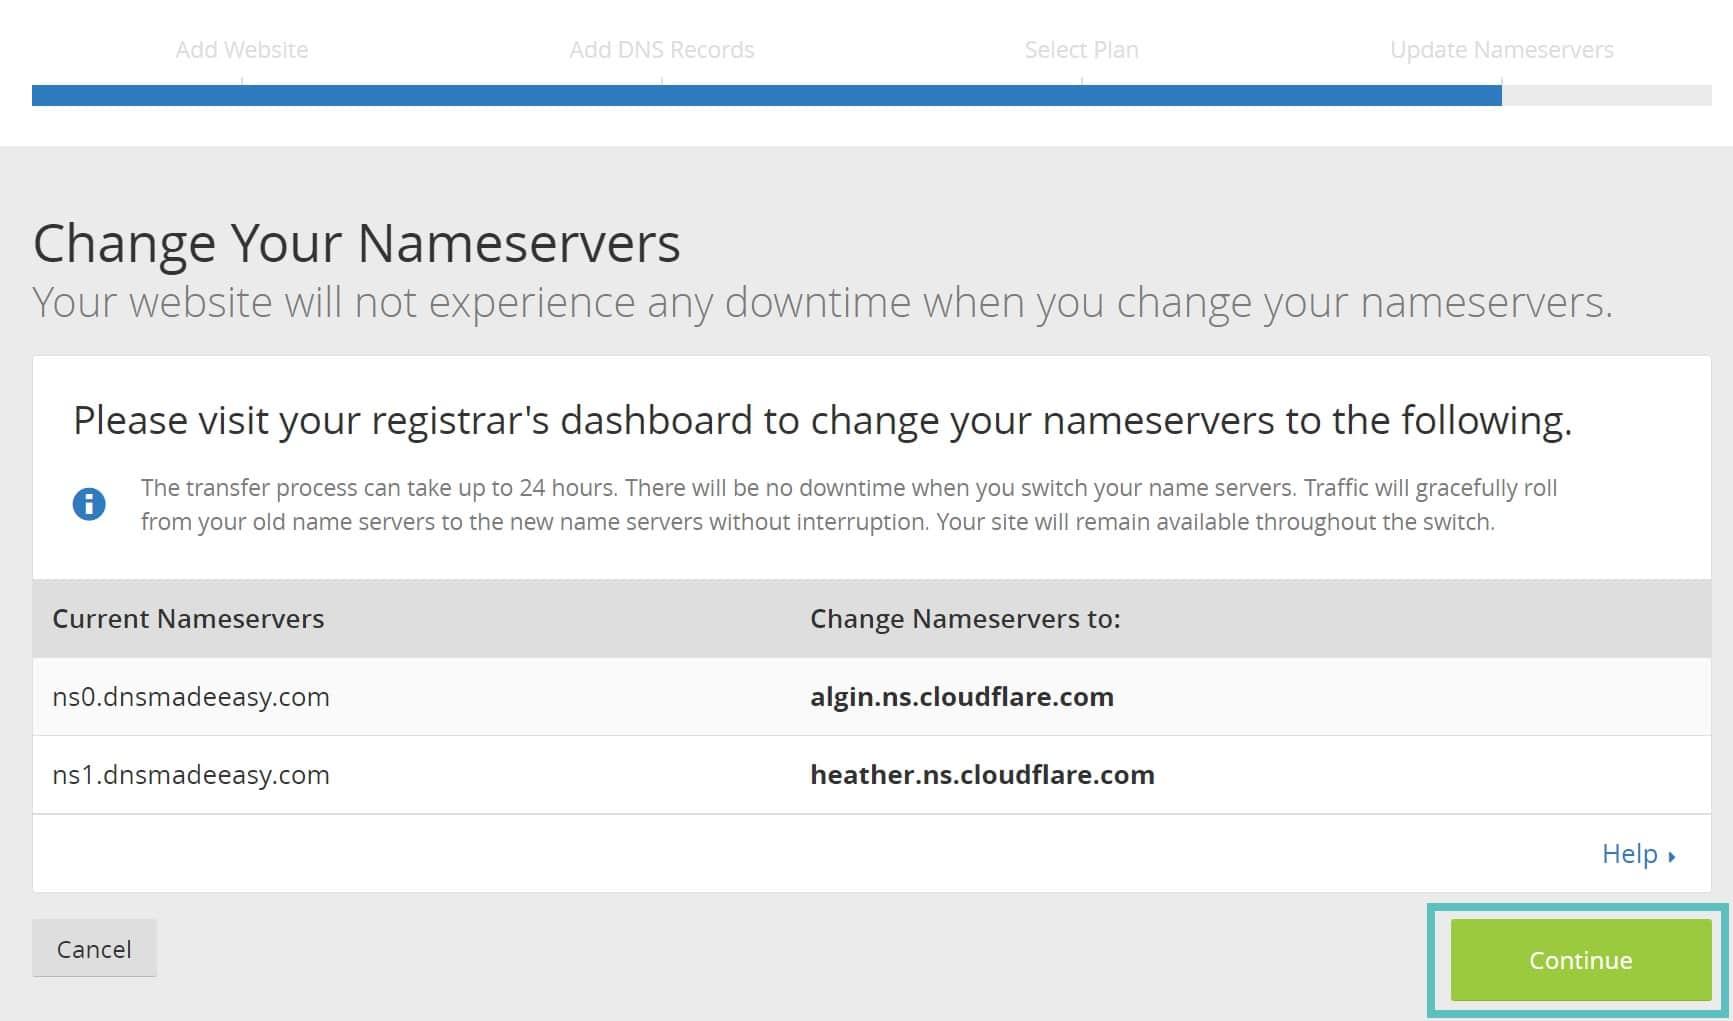 Byt till Cloudflares namnservrar